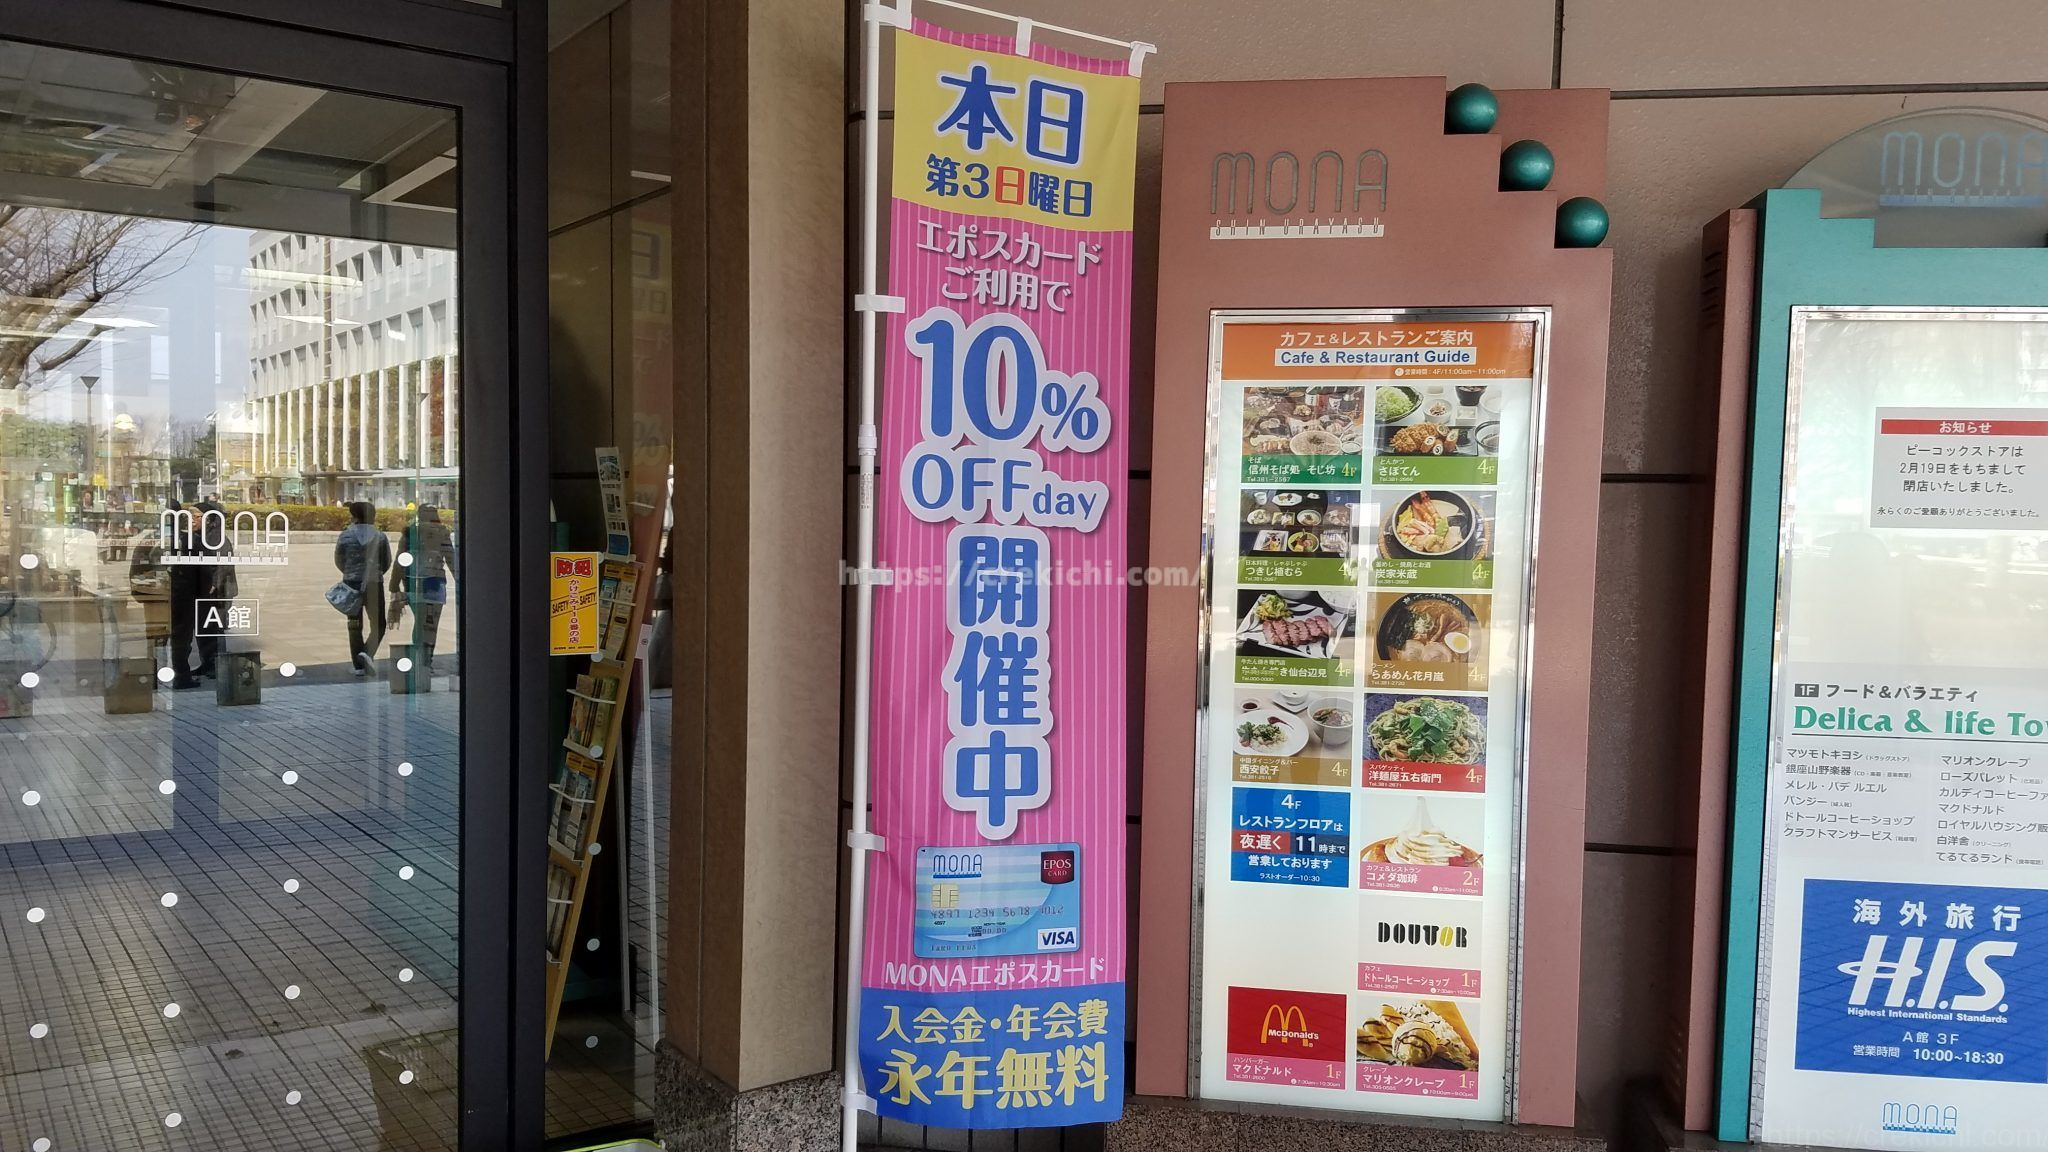 MONA新浦安 毎月第三日曜エポスカード決済で10%オフ